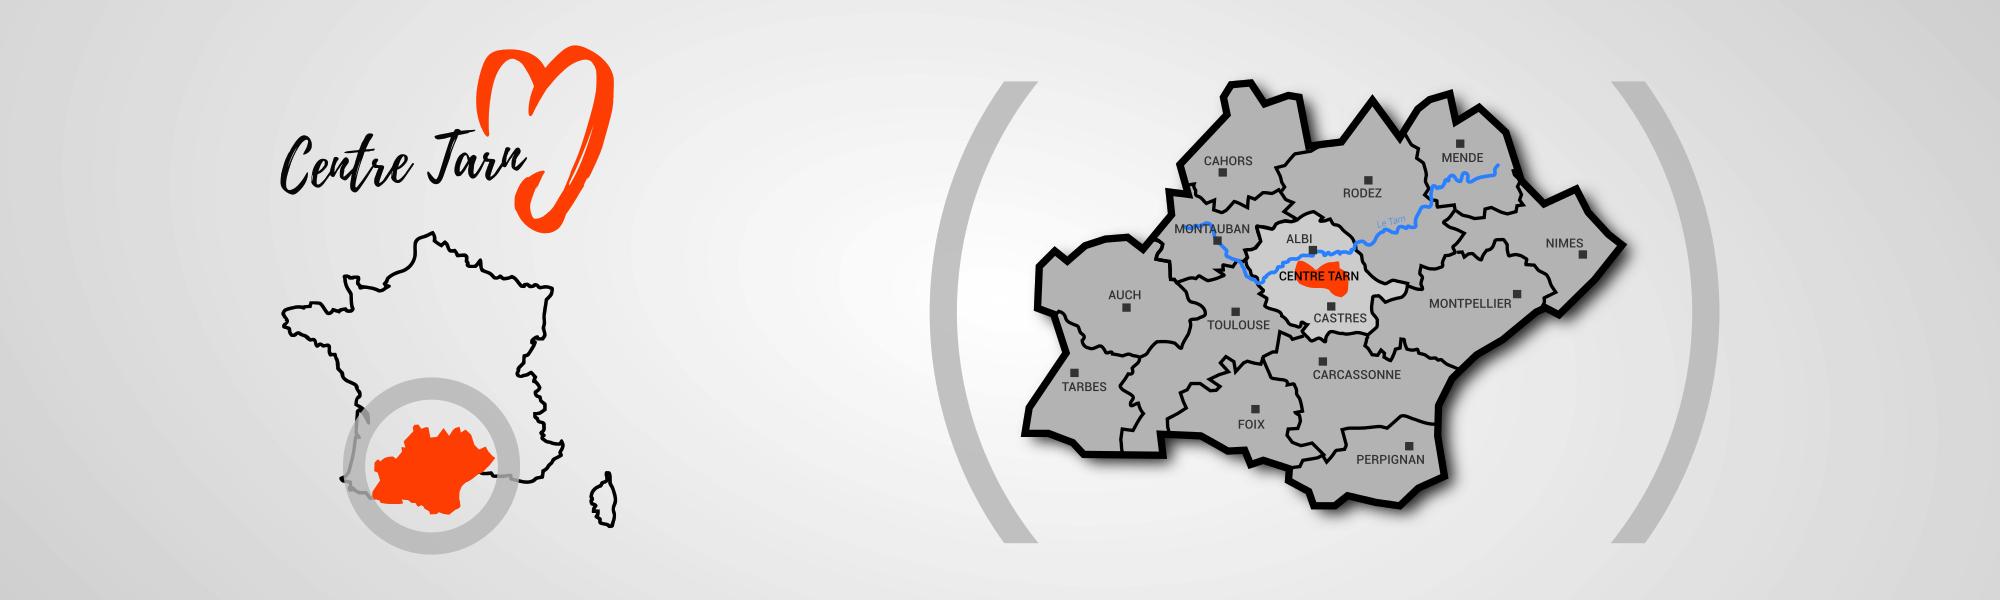 Carte du Centre Tarn